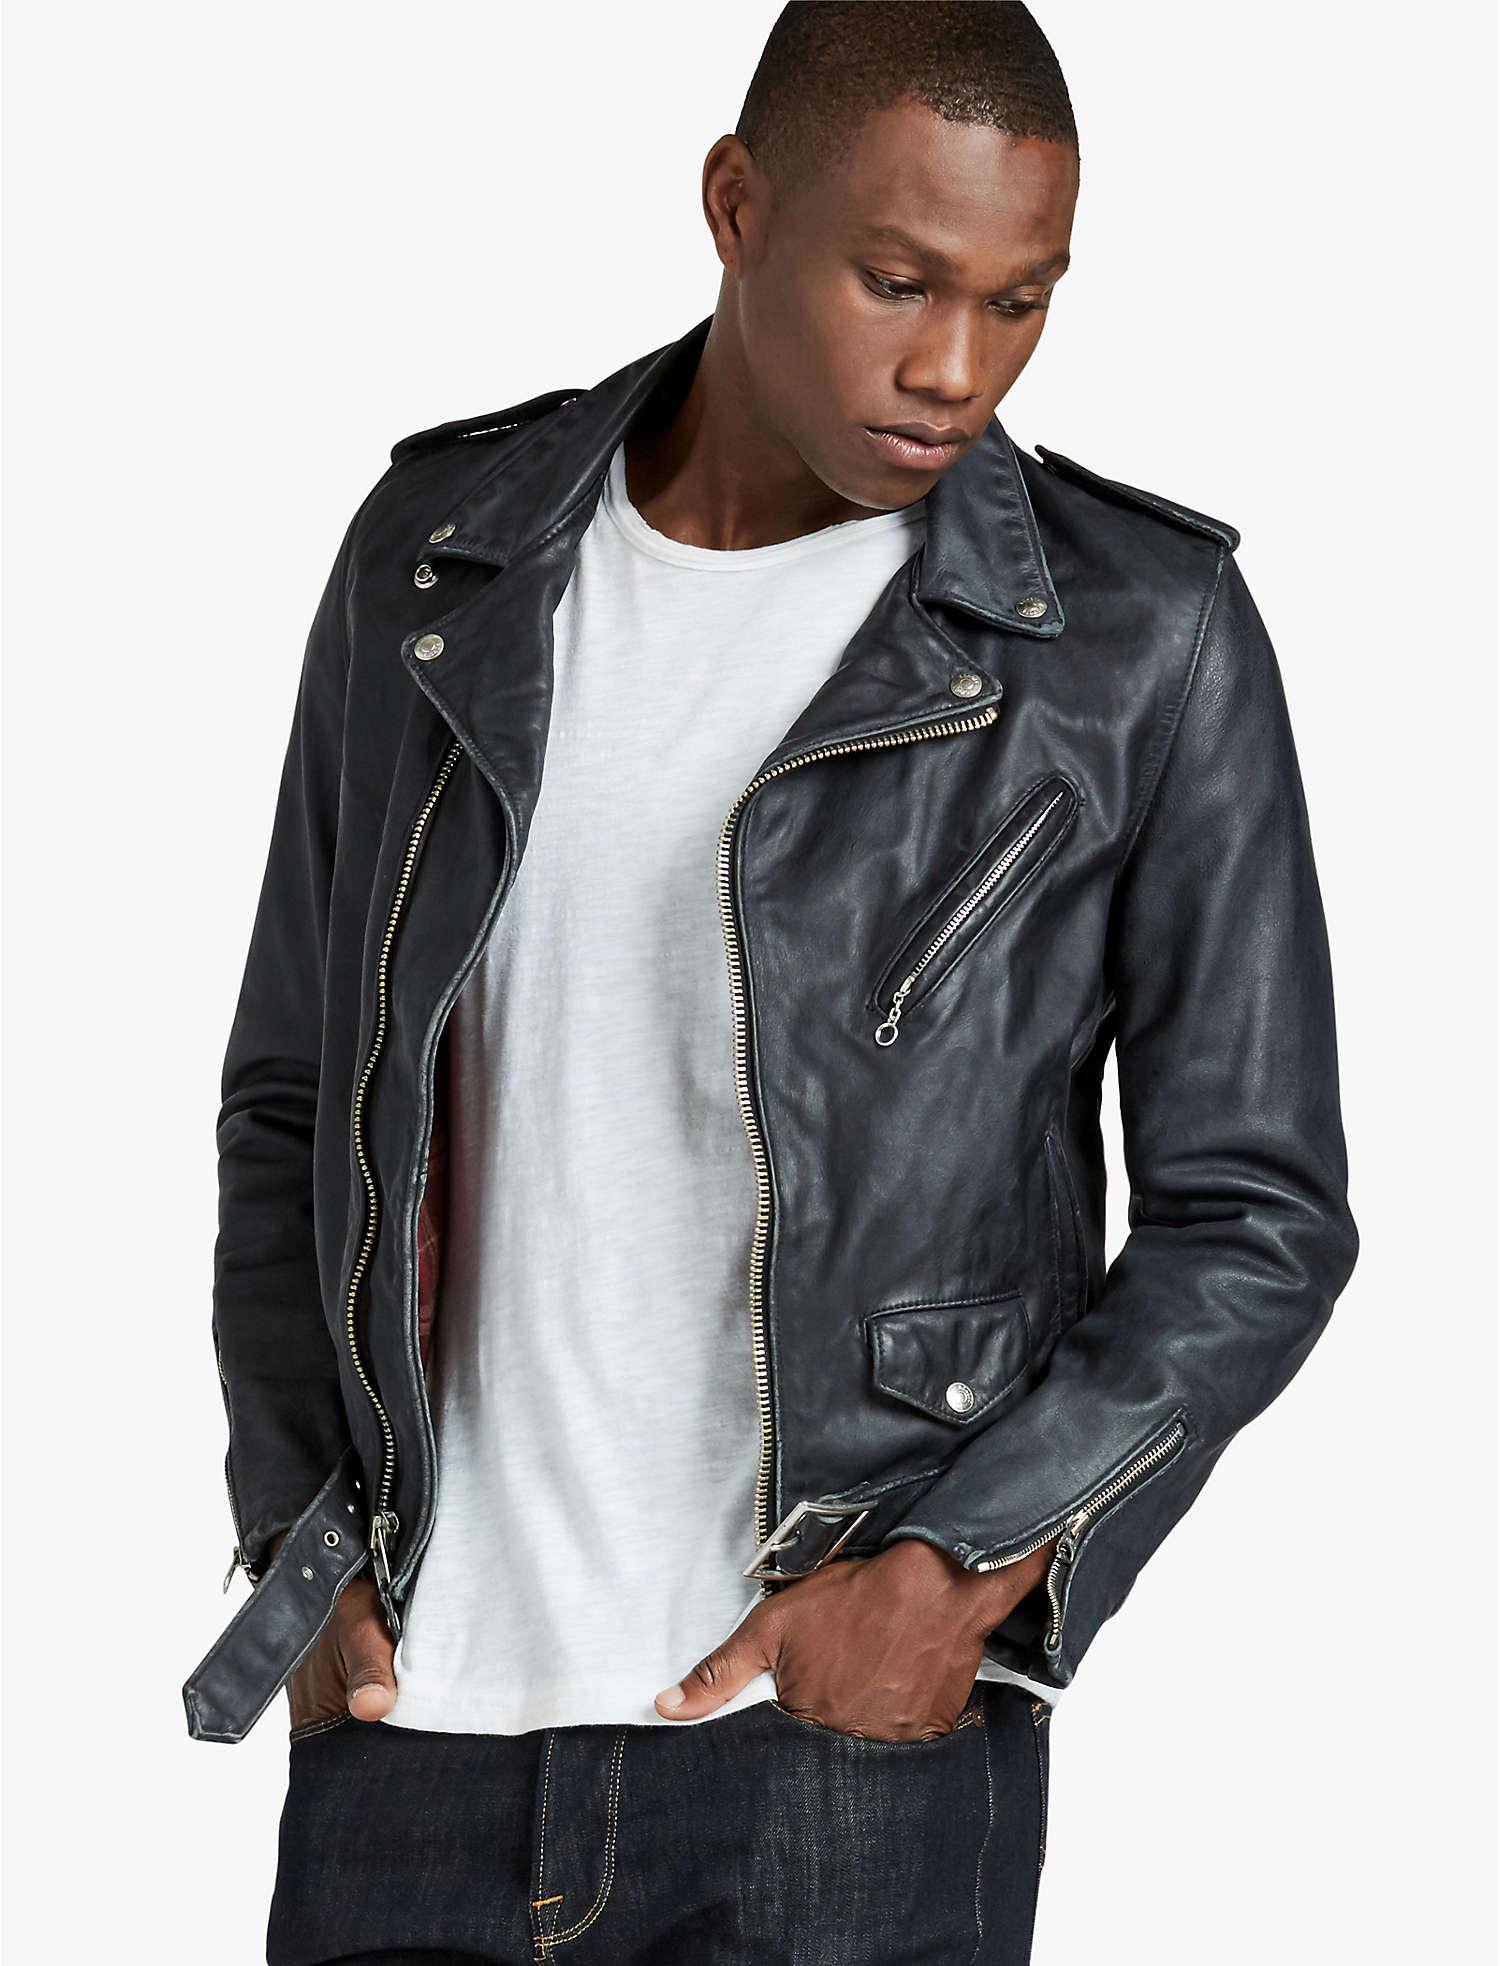 Schott X Lb Bowery Jacket // Schott Perfecto 626VN Vintaged Fitted Moto Jacket // $280